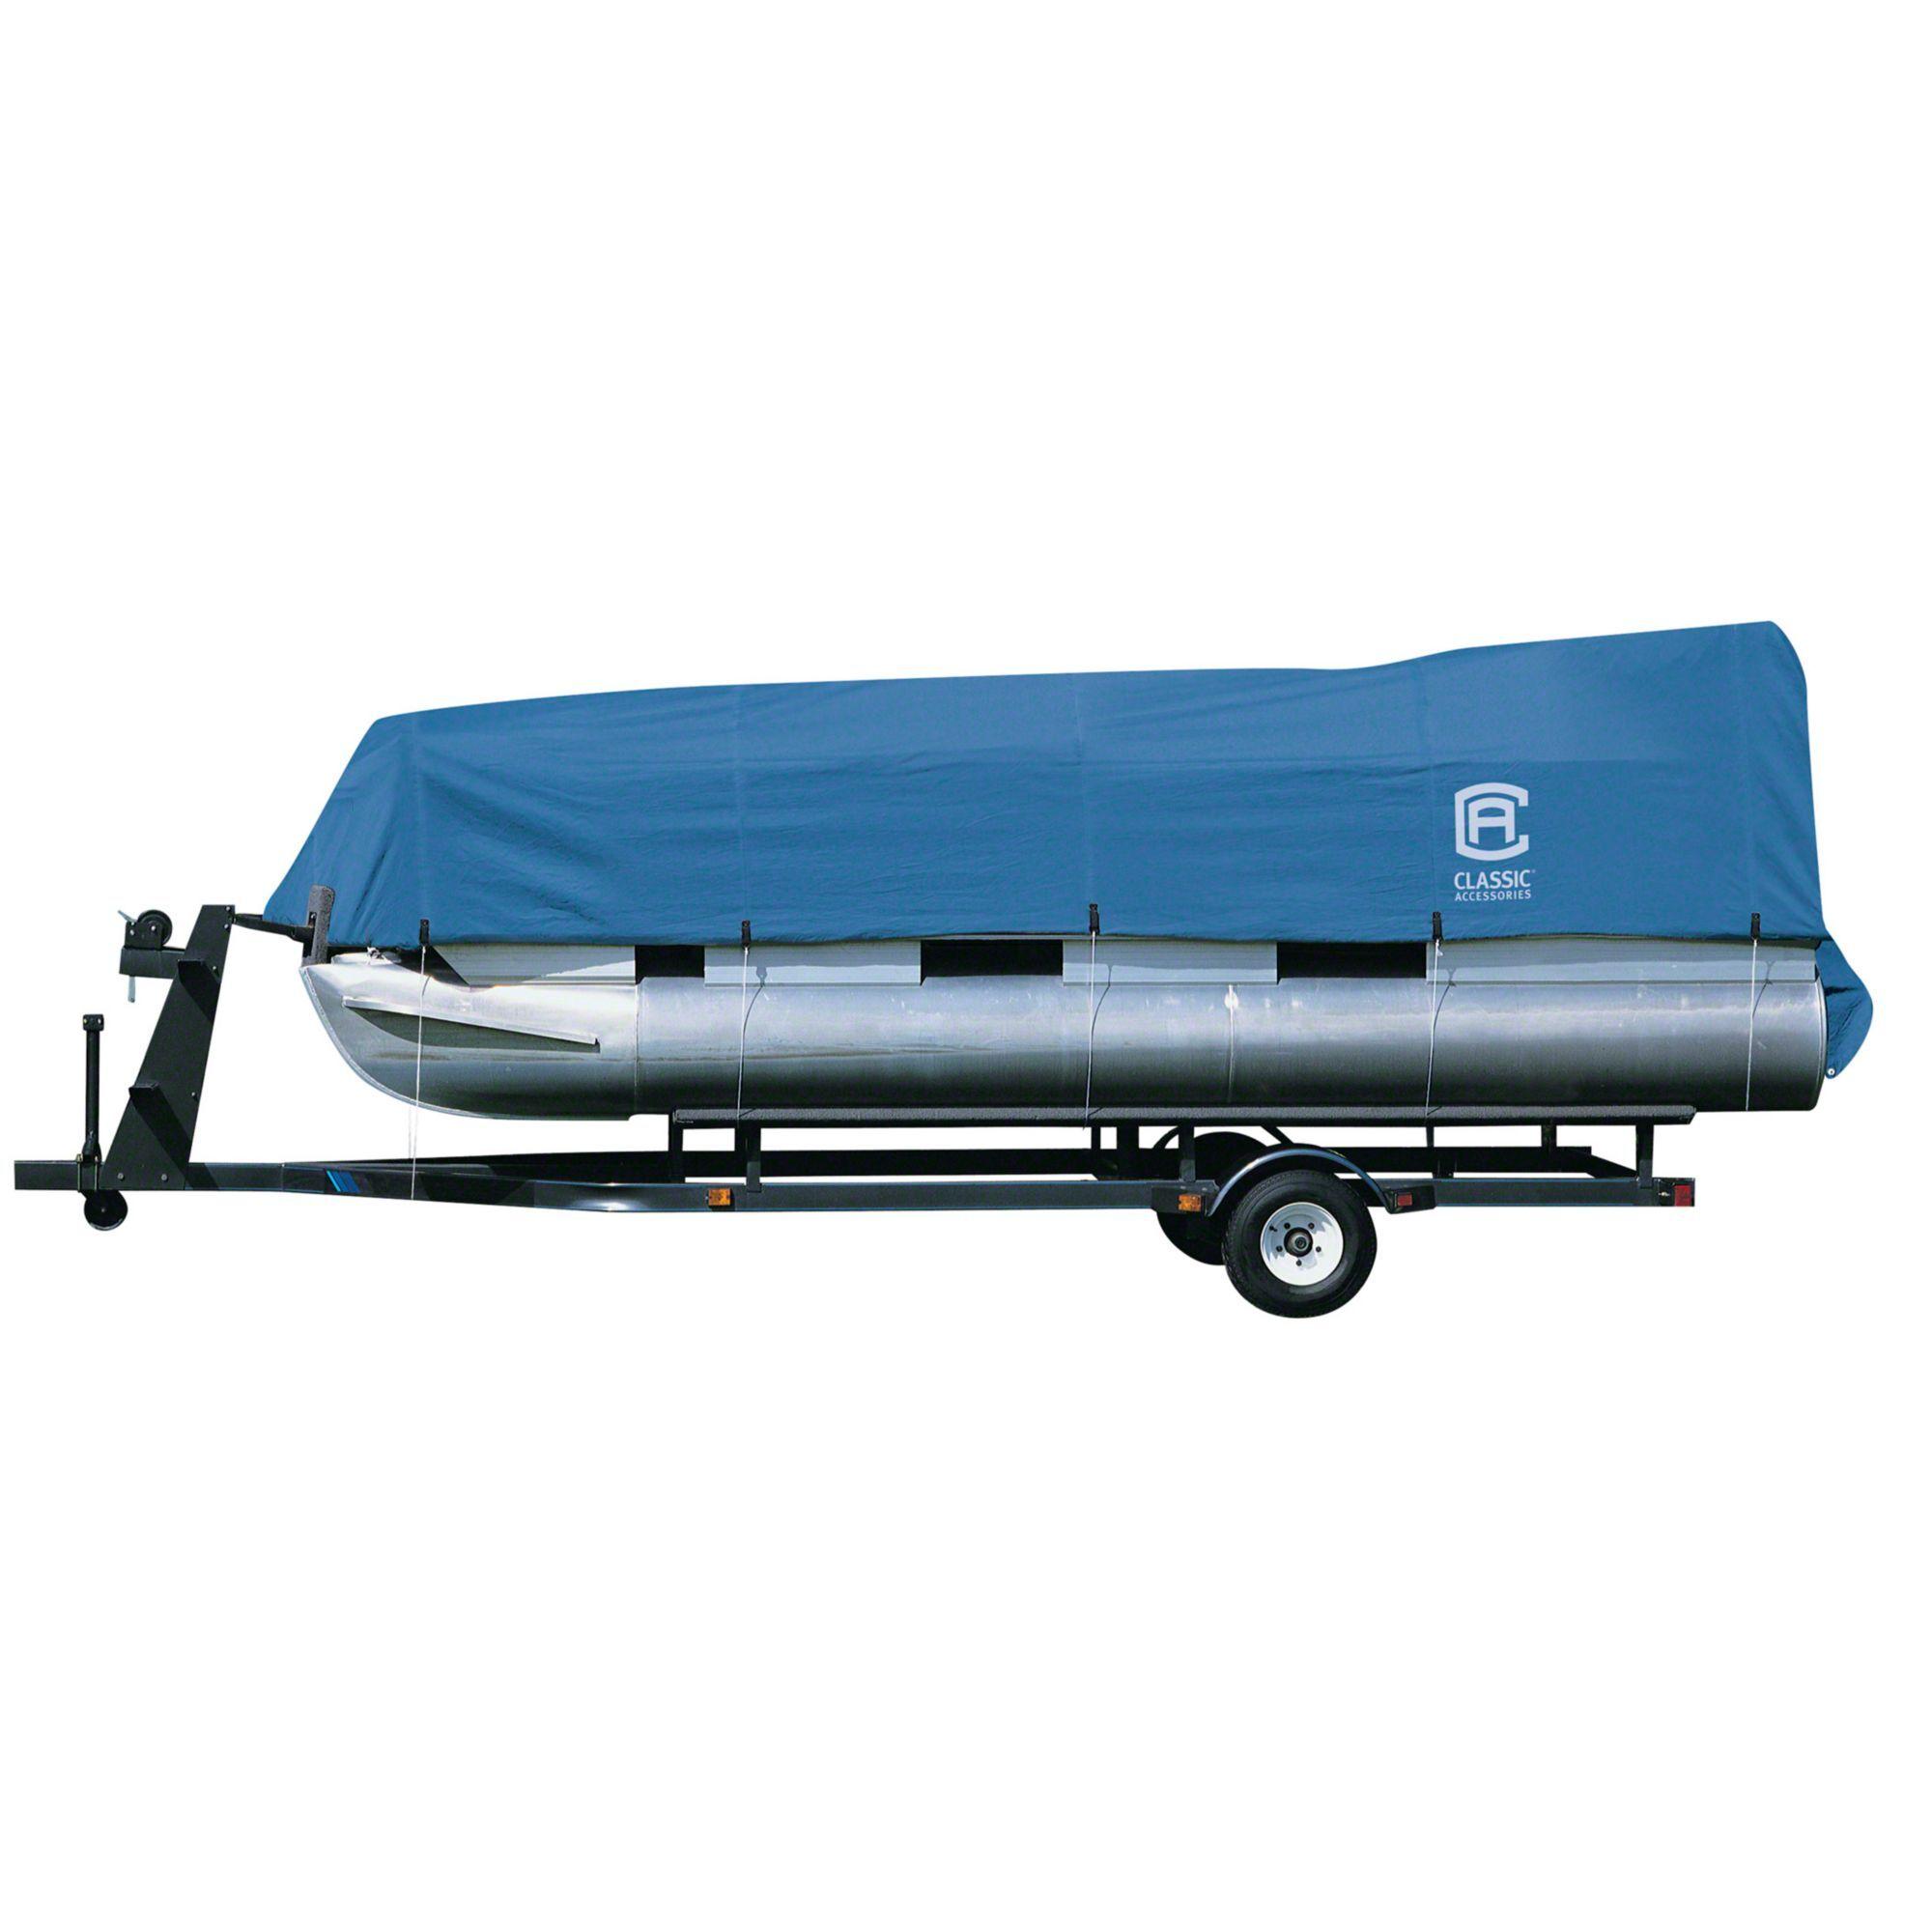 Classic Accessories Stellex Pontoon Boat Cover, Blue